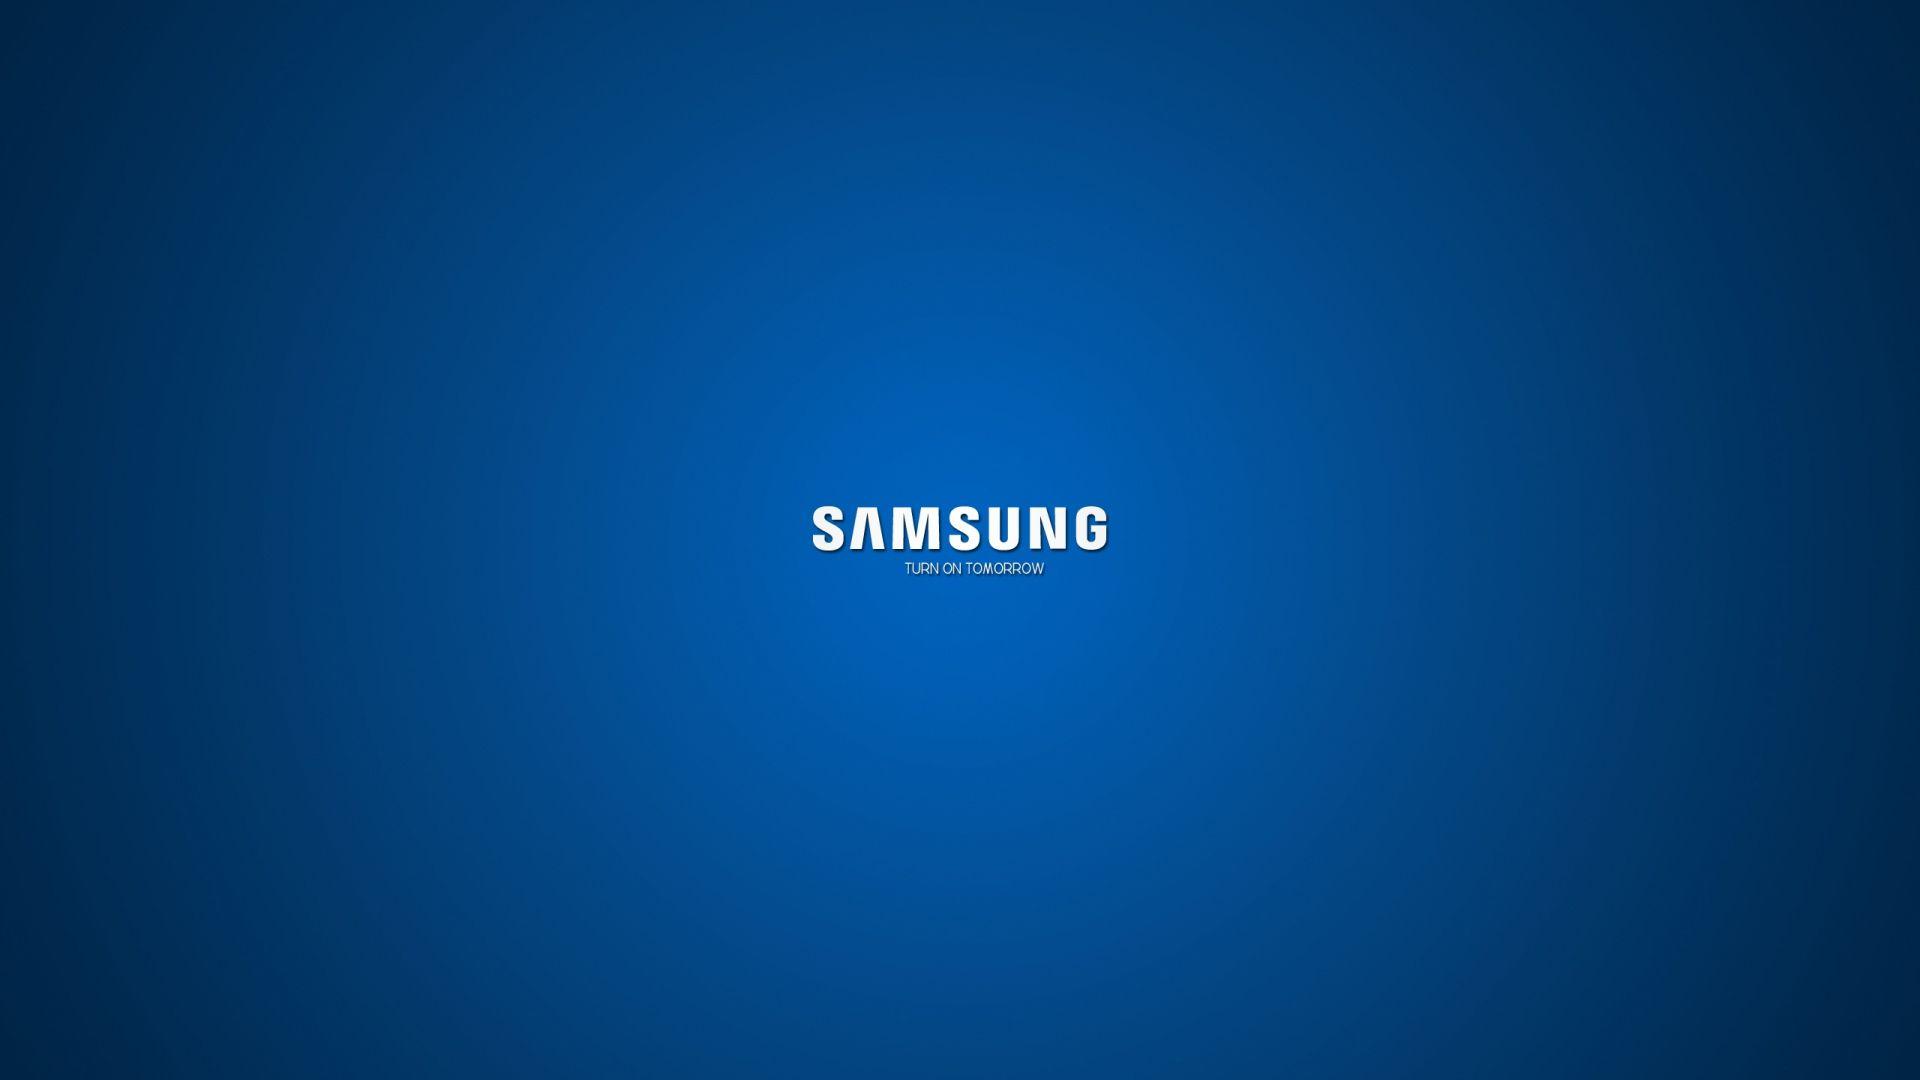 Download Wallpaper 1920x1080 Samsung Company Logo Blue White Full Hd 1080p Hd Background Samsung Logo Samsung Galaxy Wallpaper Samsung Laptop